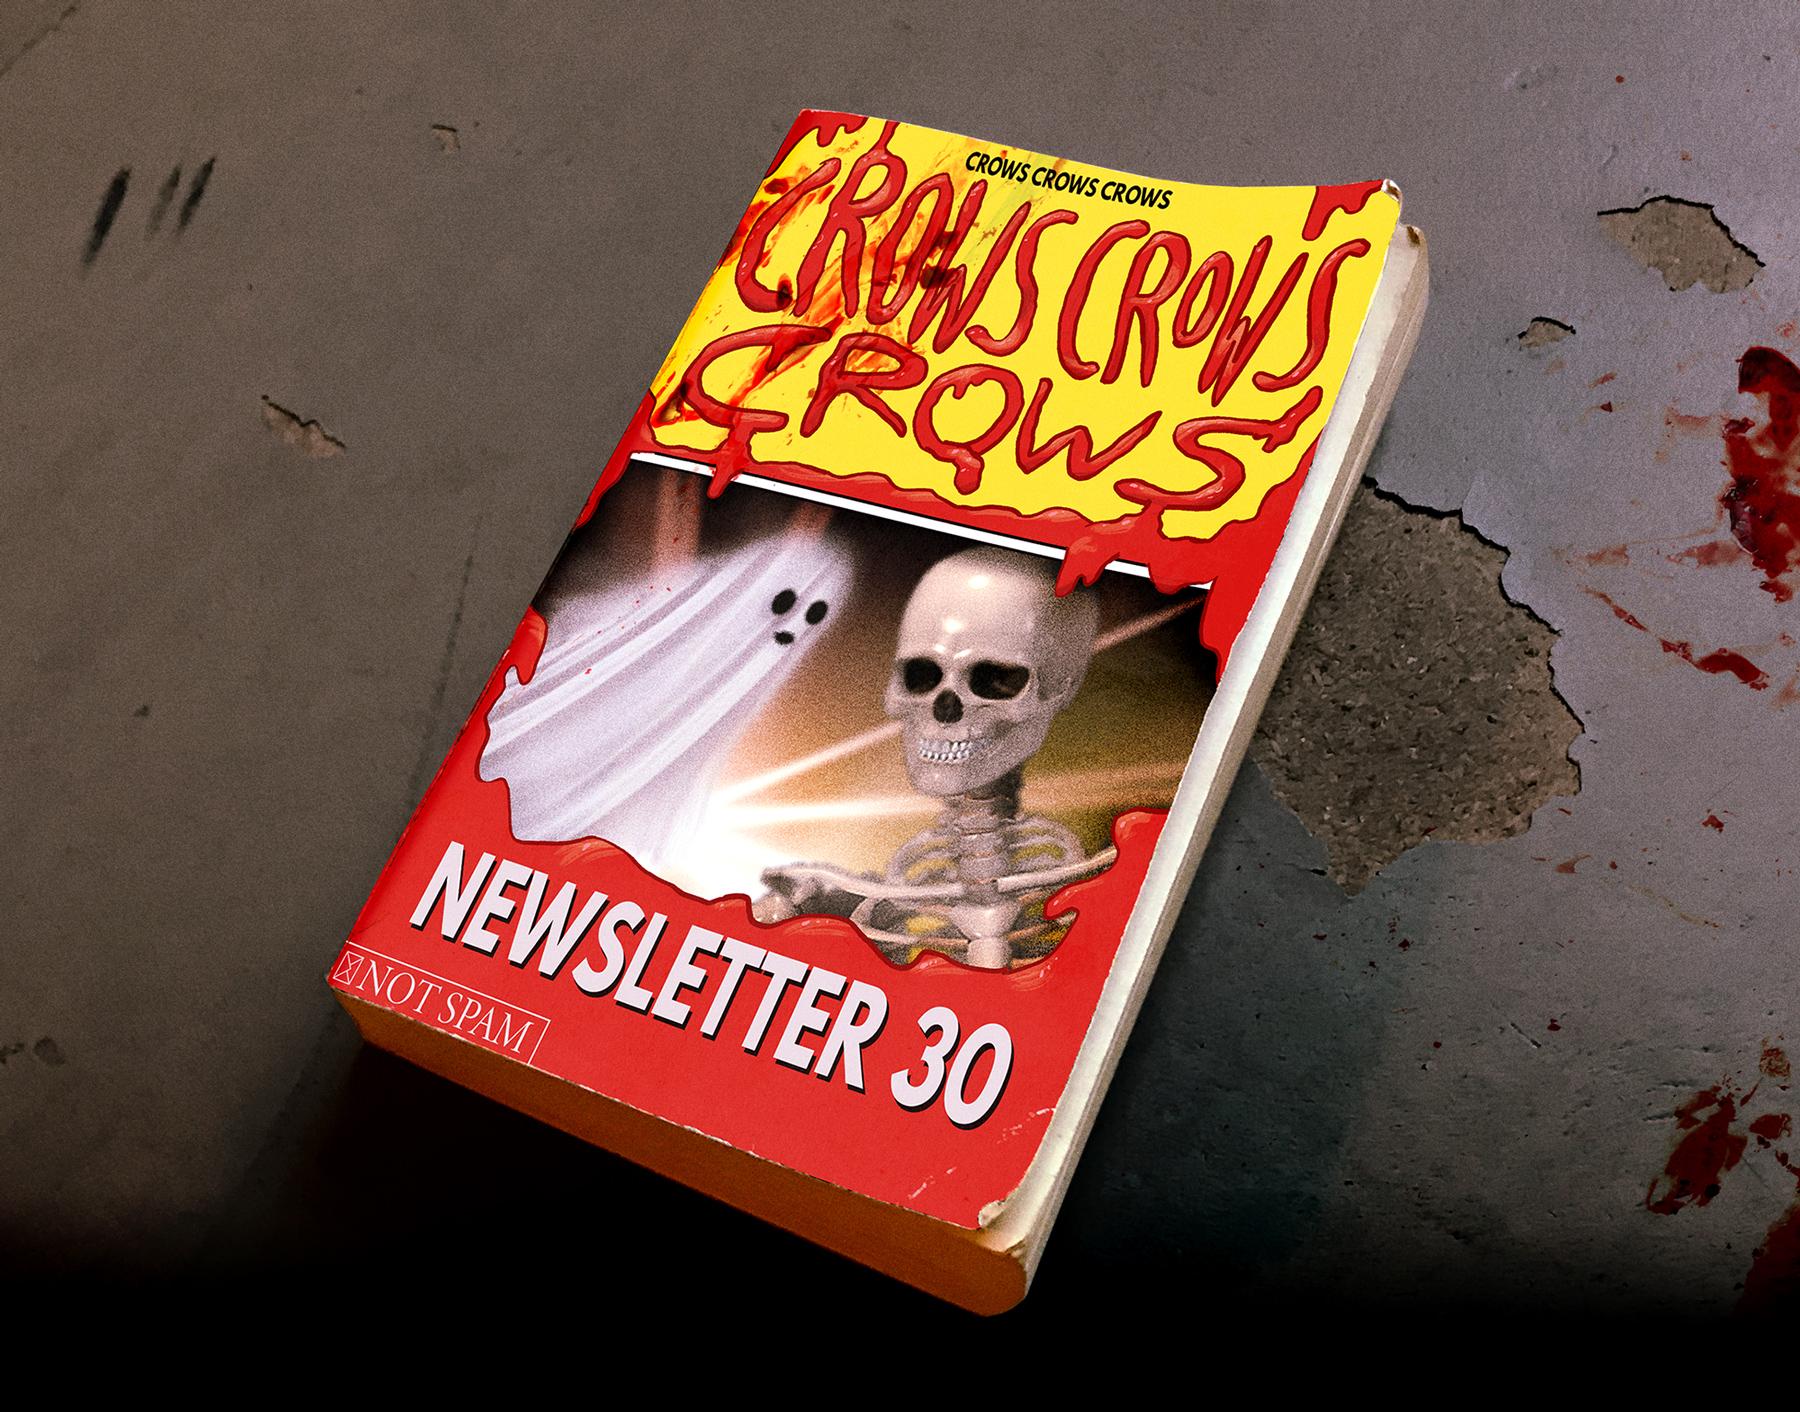 SPOOKY HEADER IMAGE! NEWSLETTER 30!!